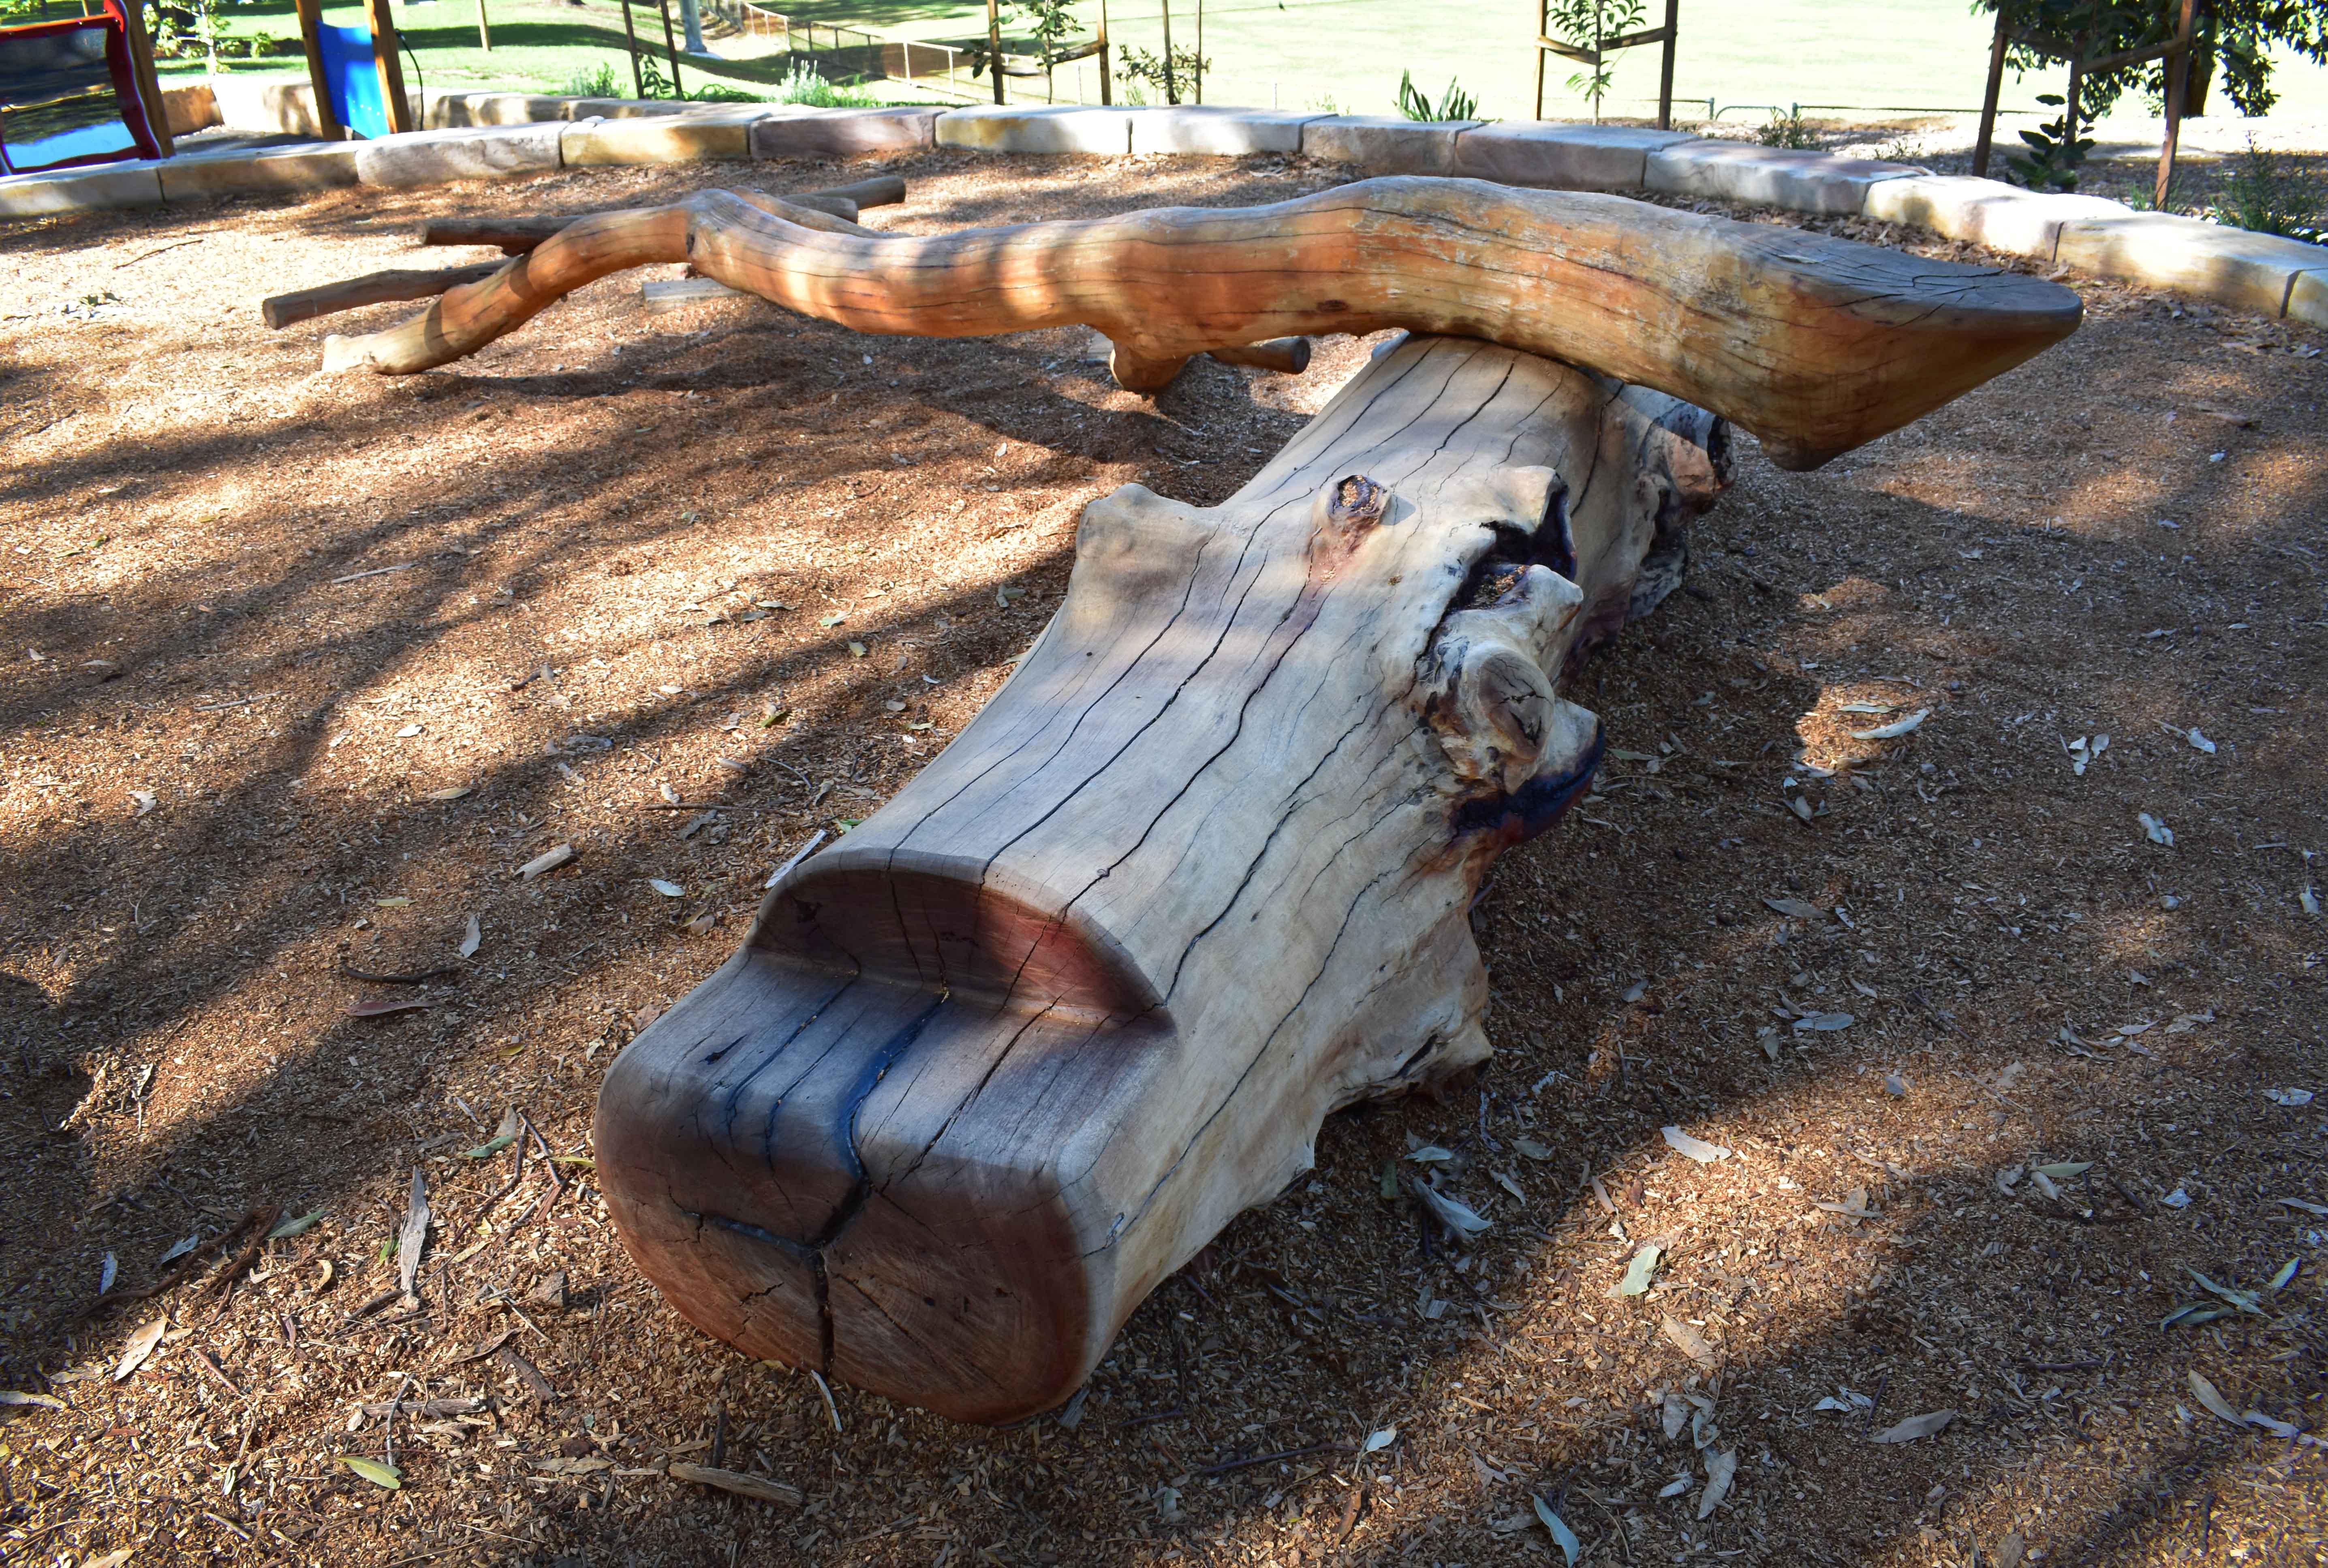 Log balance challenges